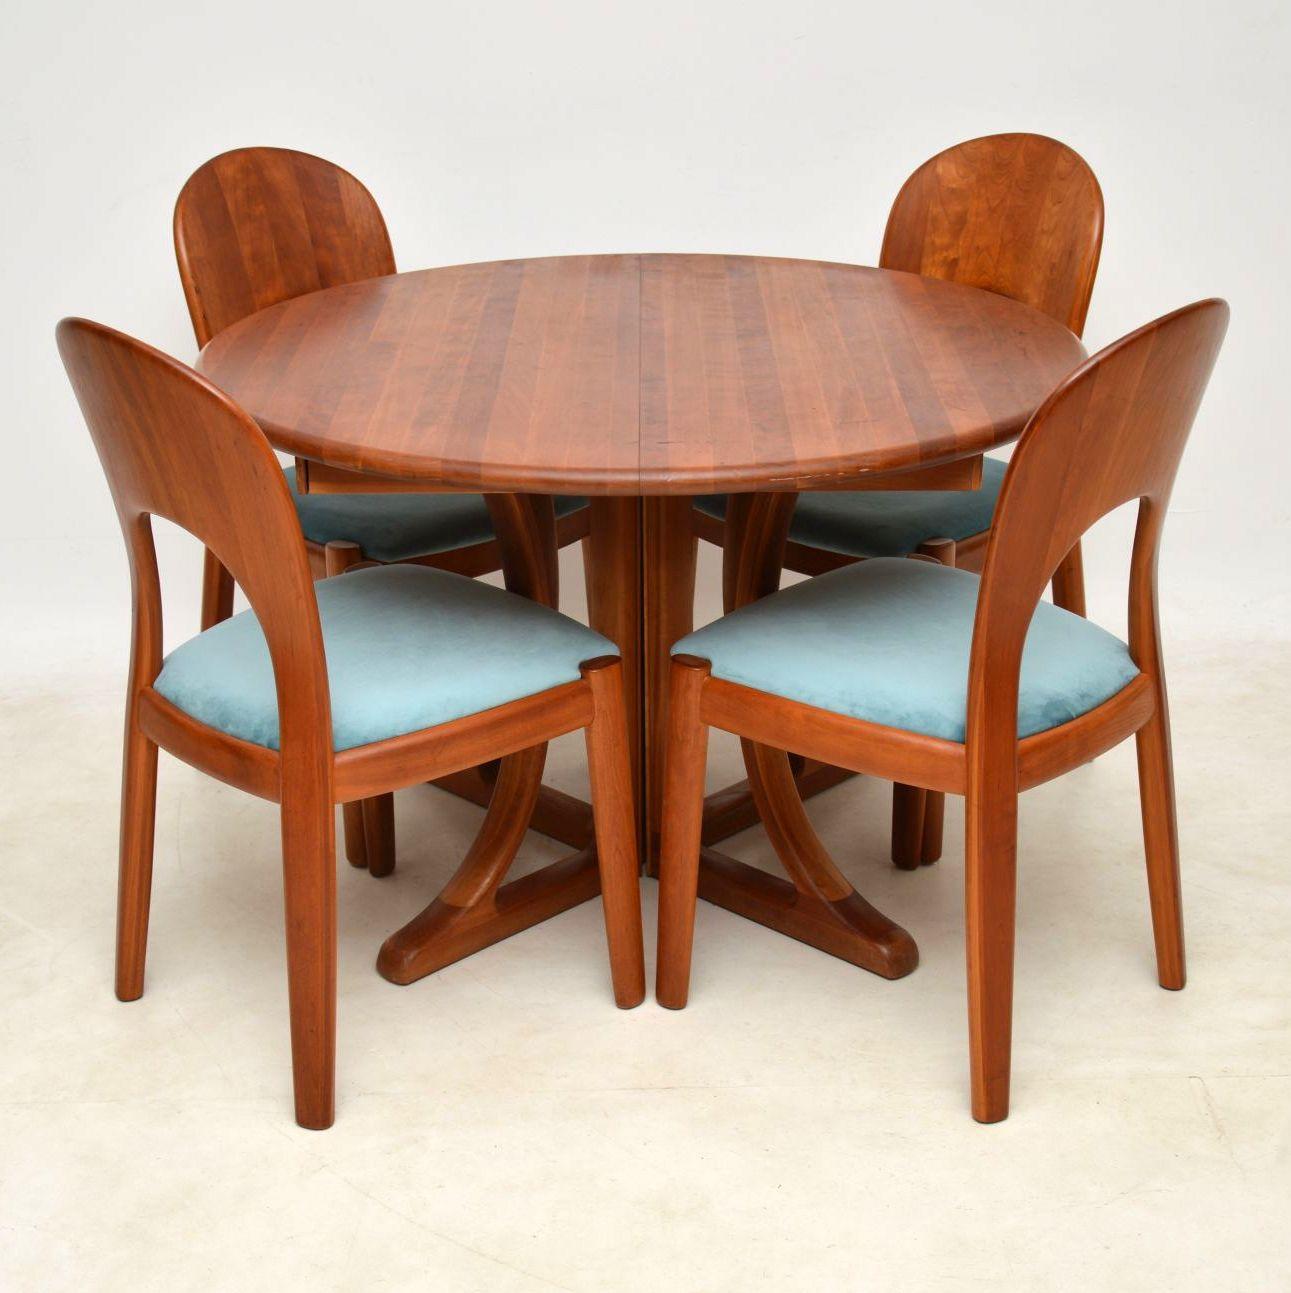 1960's Danish Teak Dining Table & Chairs by Niels Koefoed ...